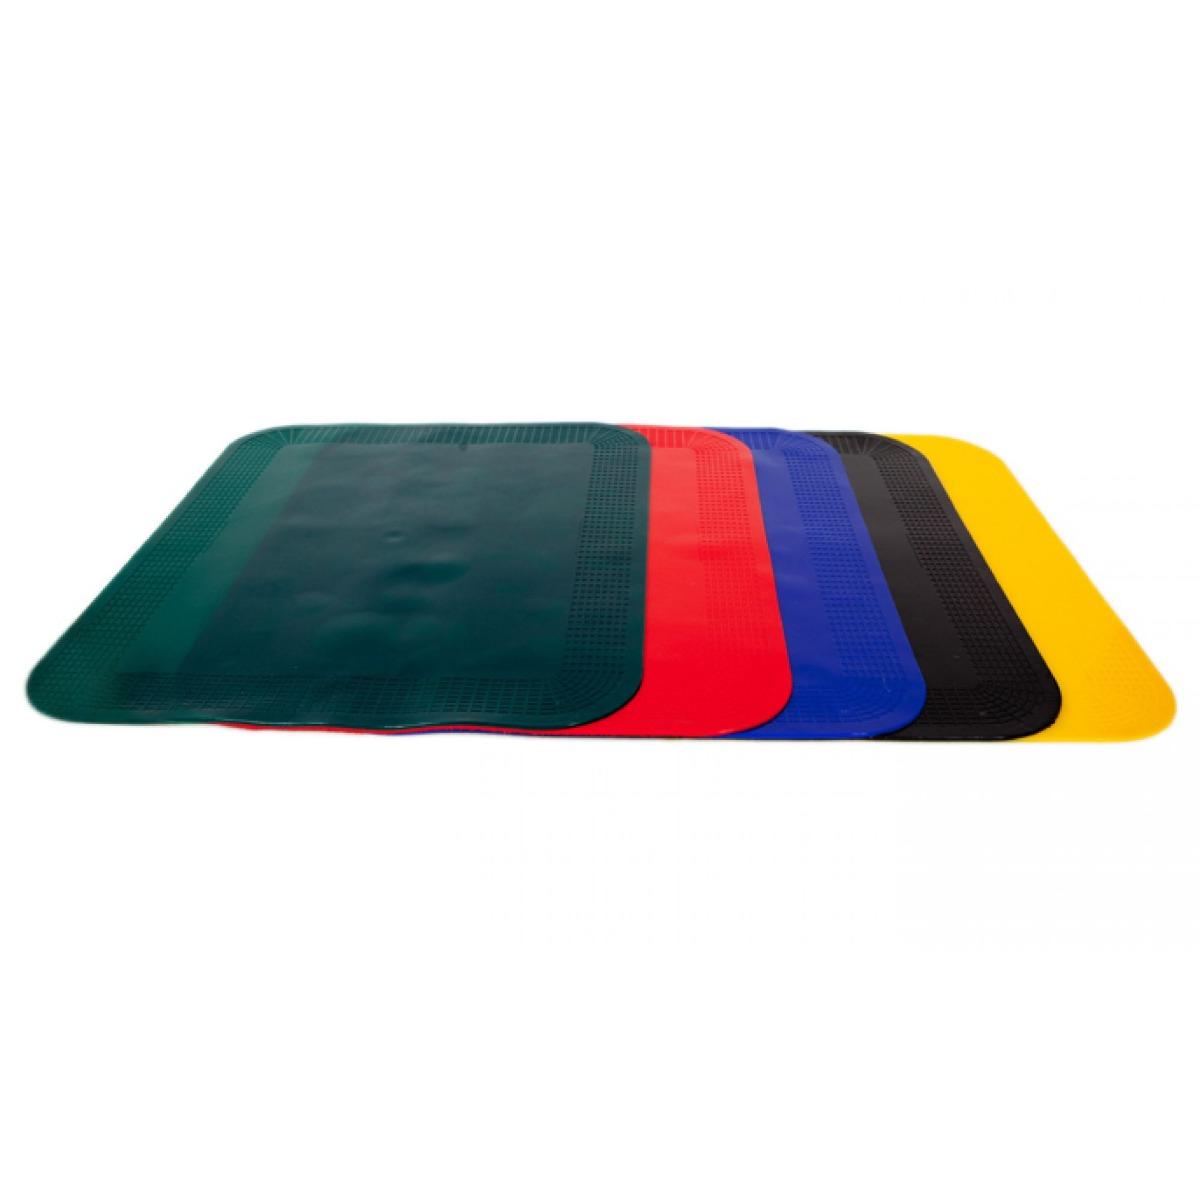 Dycem Non-Slip Activity Pad